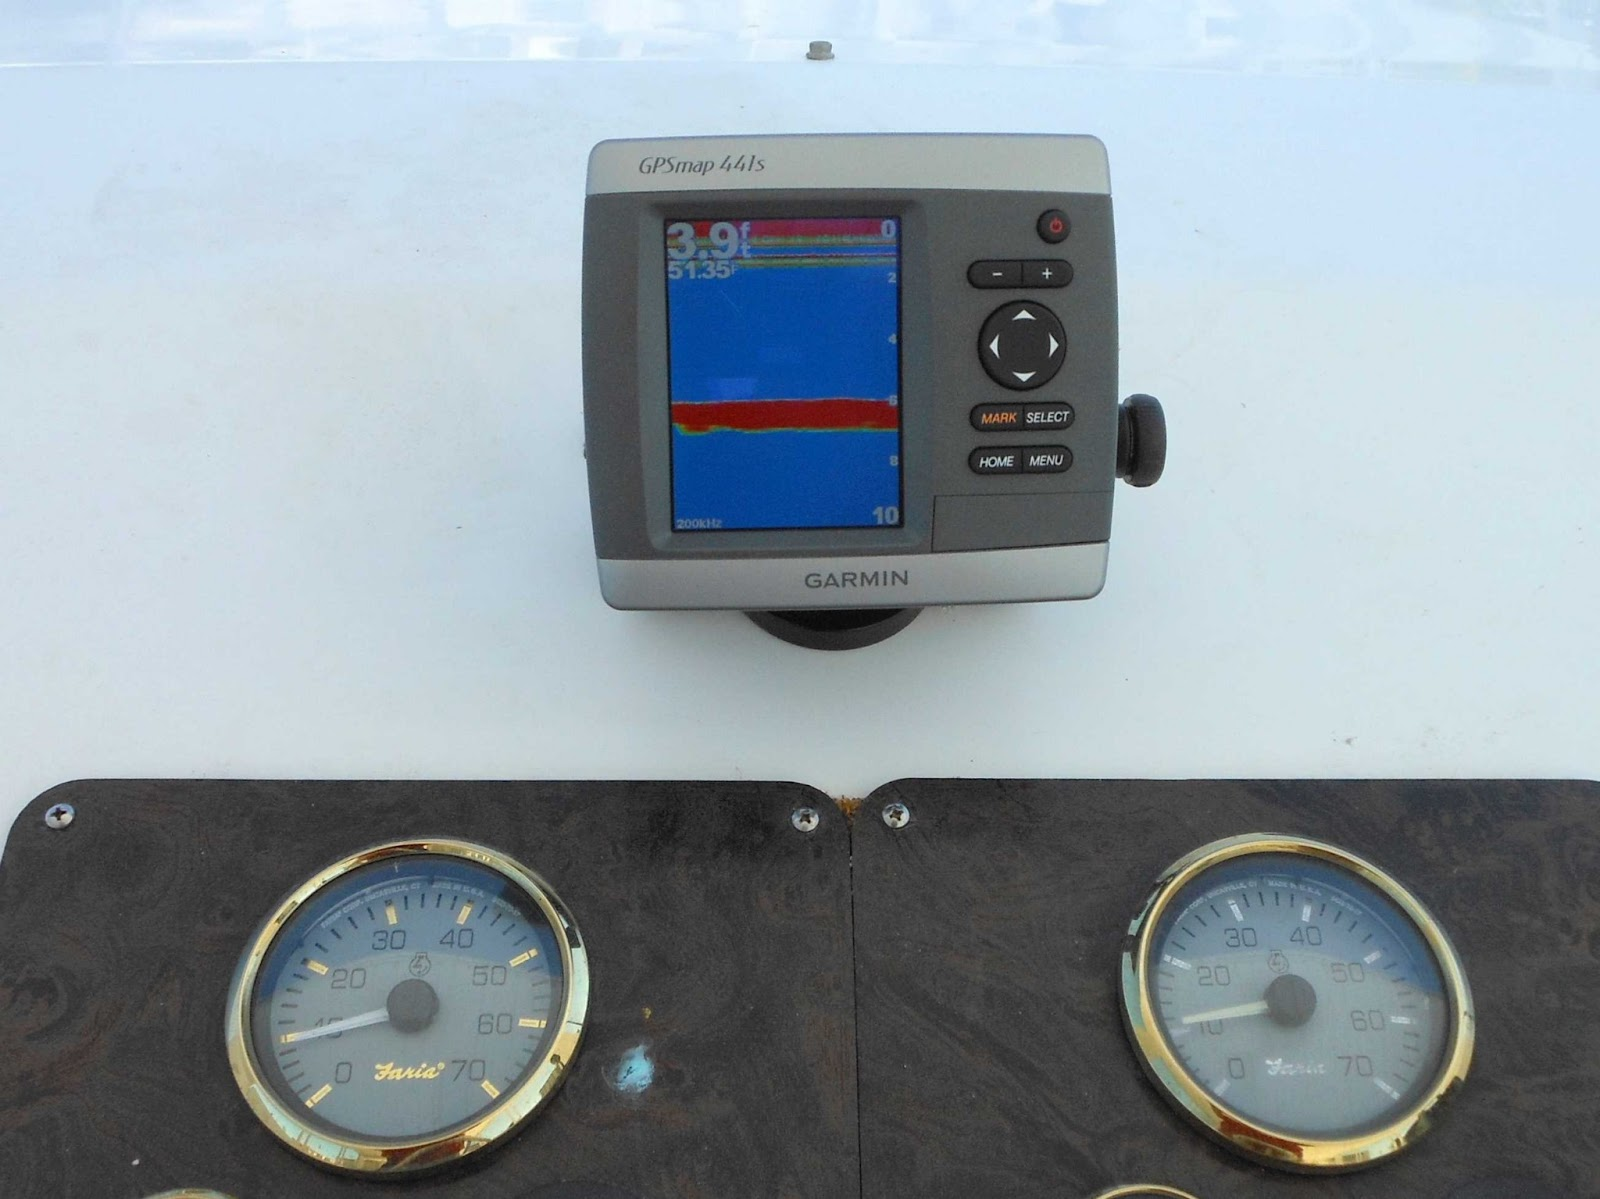 medium resolution of garmin striker series 4 wiring diagram data mapping garmin 160 fishfinder wiring garmin transducer 4 pin